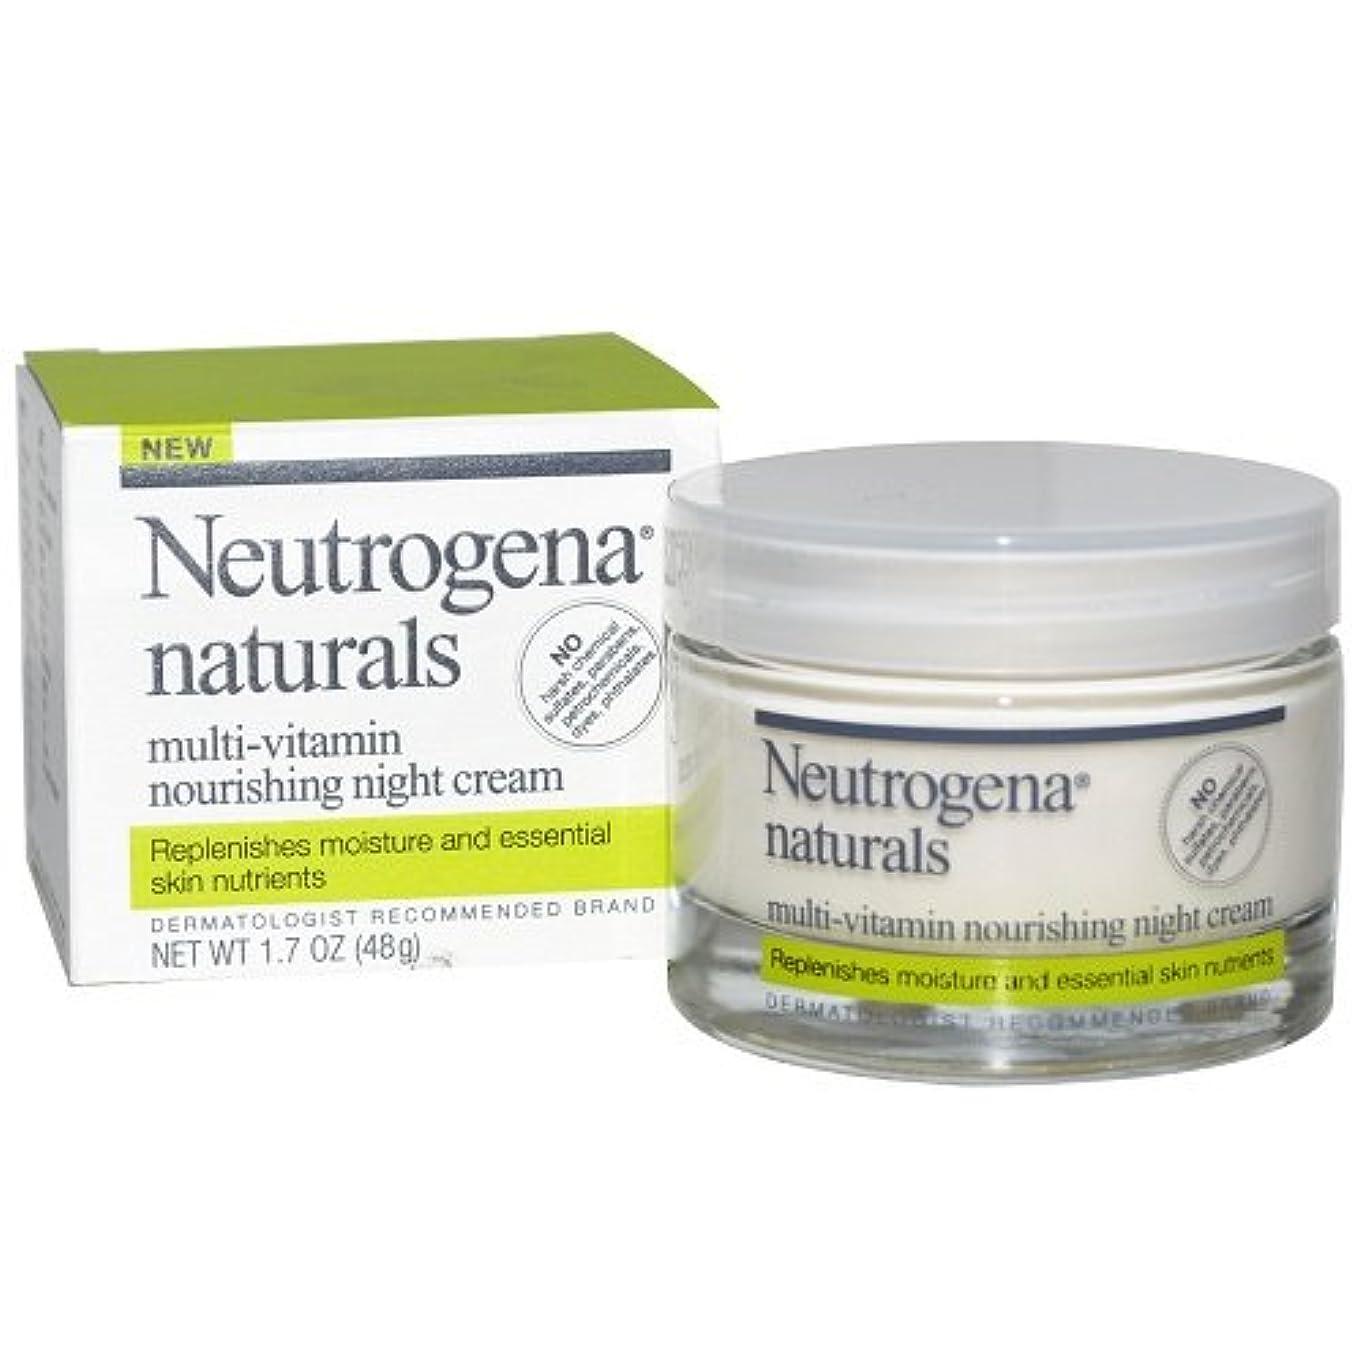 [海外直送品] Neutrogena naturals - Multi-Vitamin Nourishing Night Cream 1.7oz(48g)